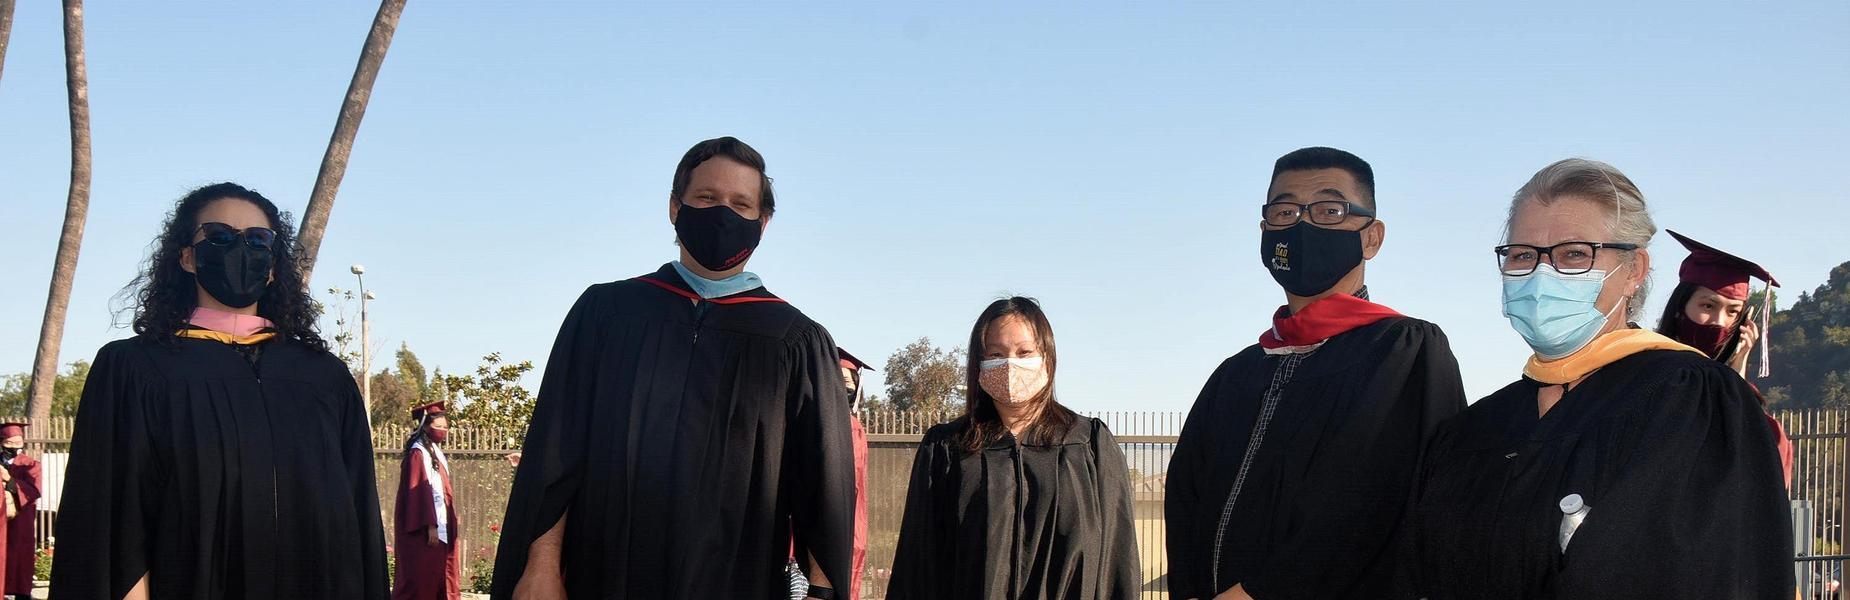 MKHS Staff at the 2021 Graduation Ceremony